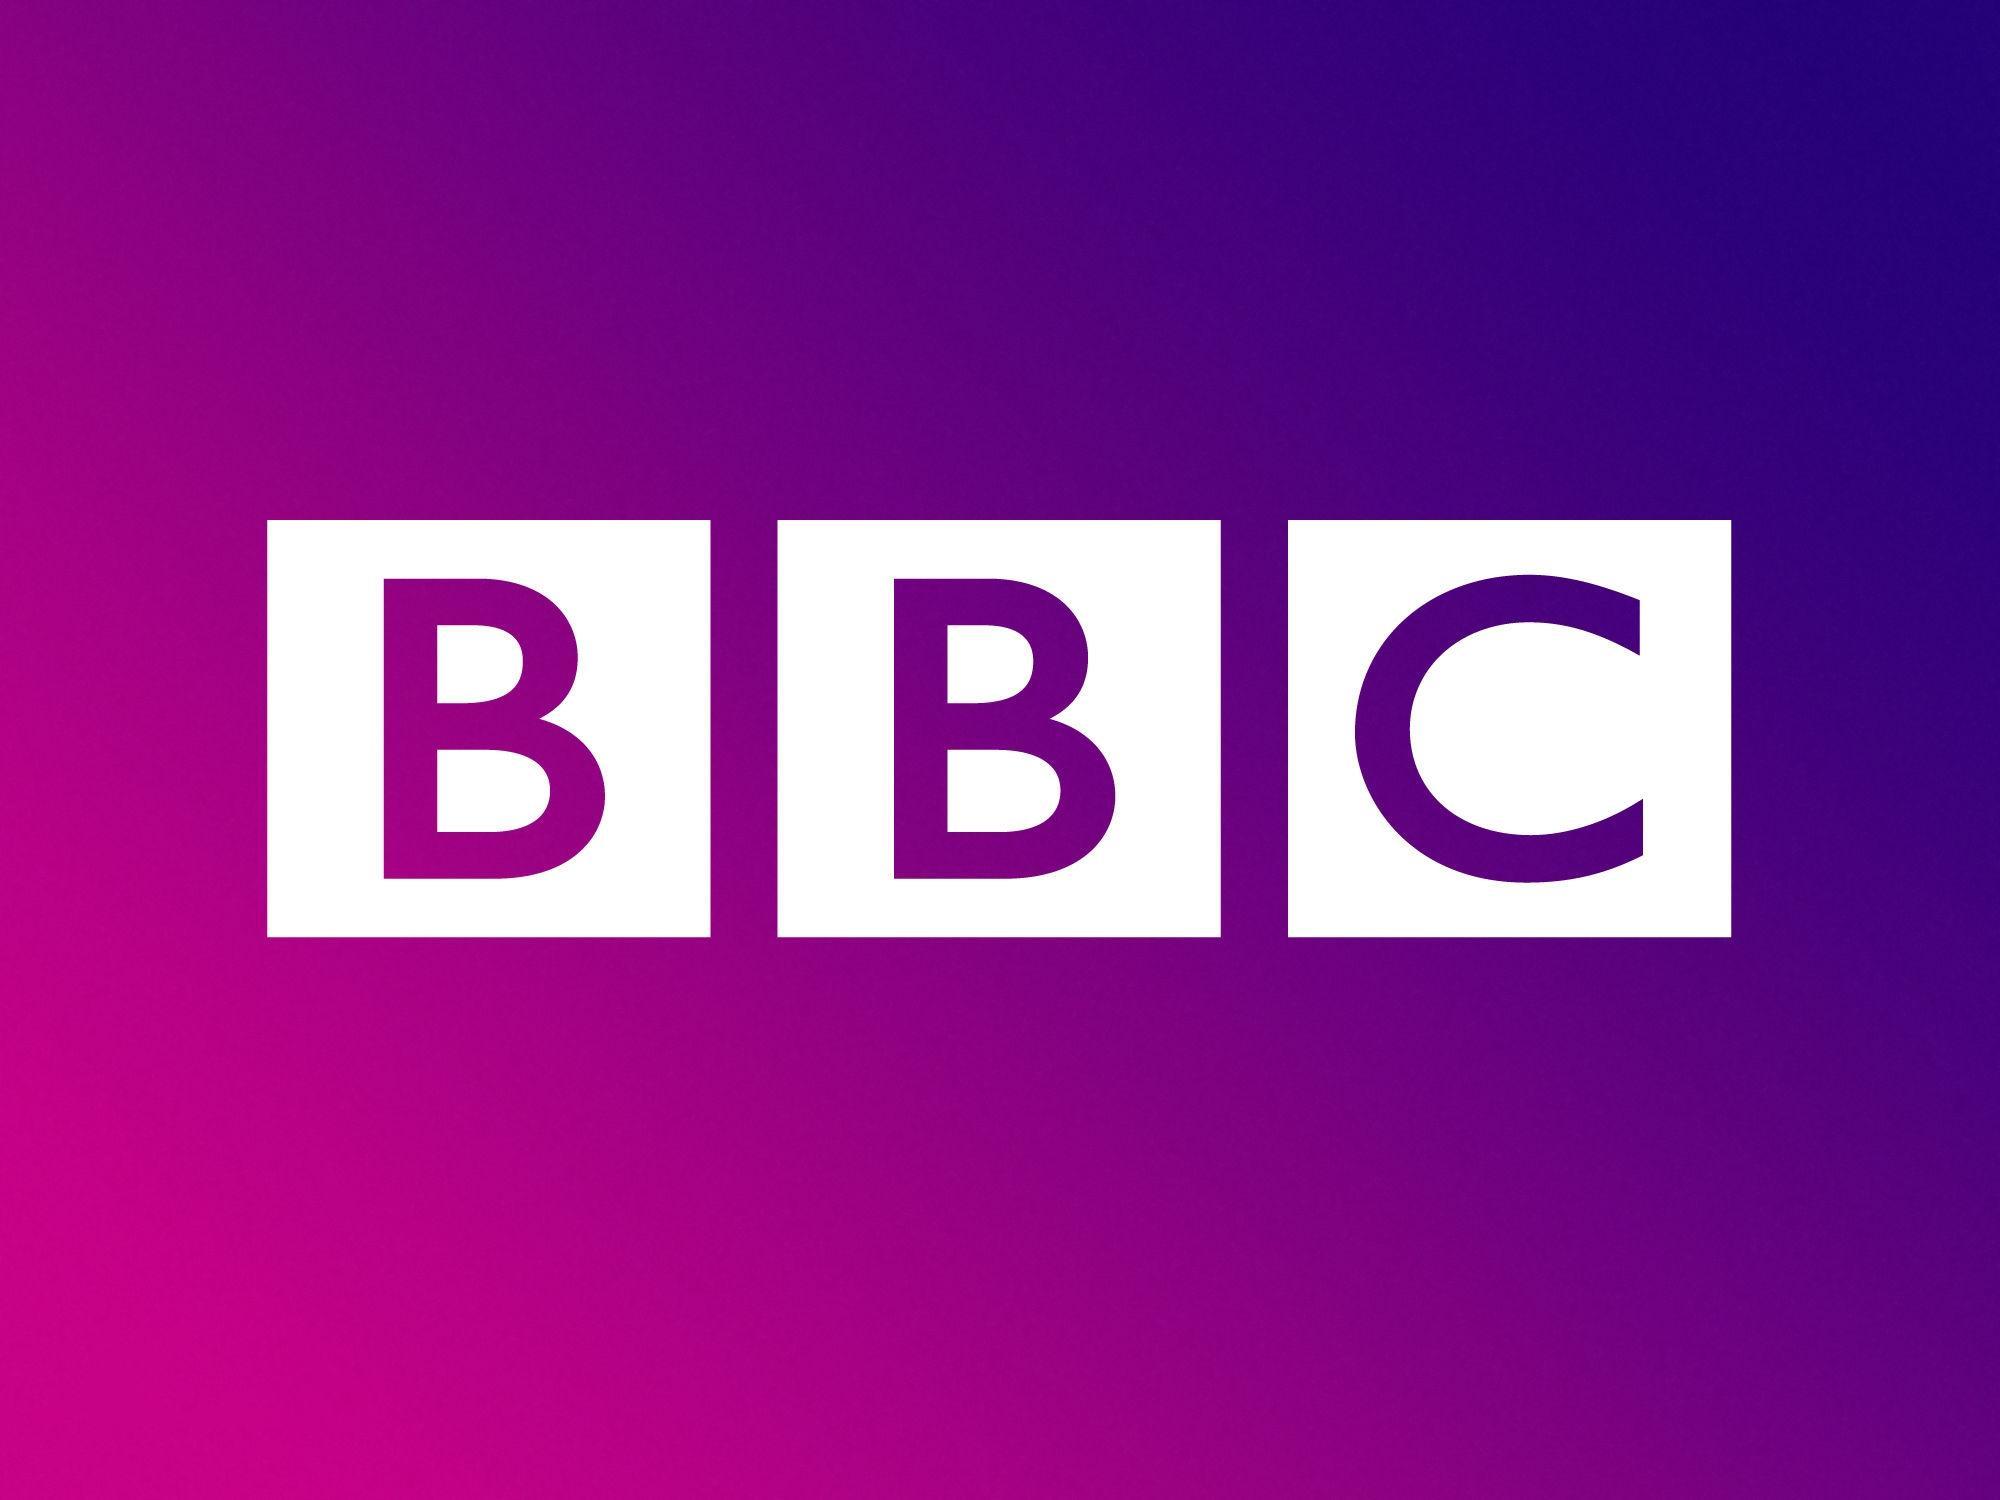 bbc是哪个国家的